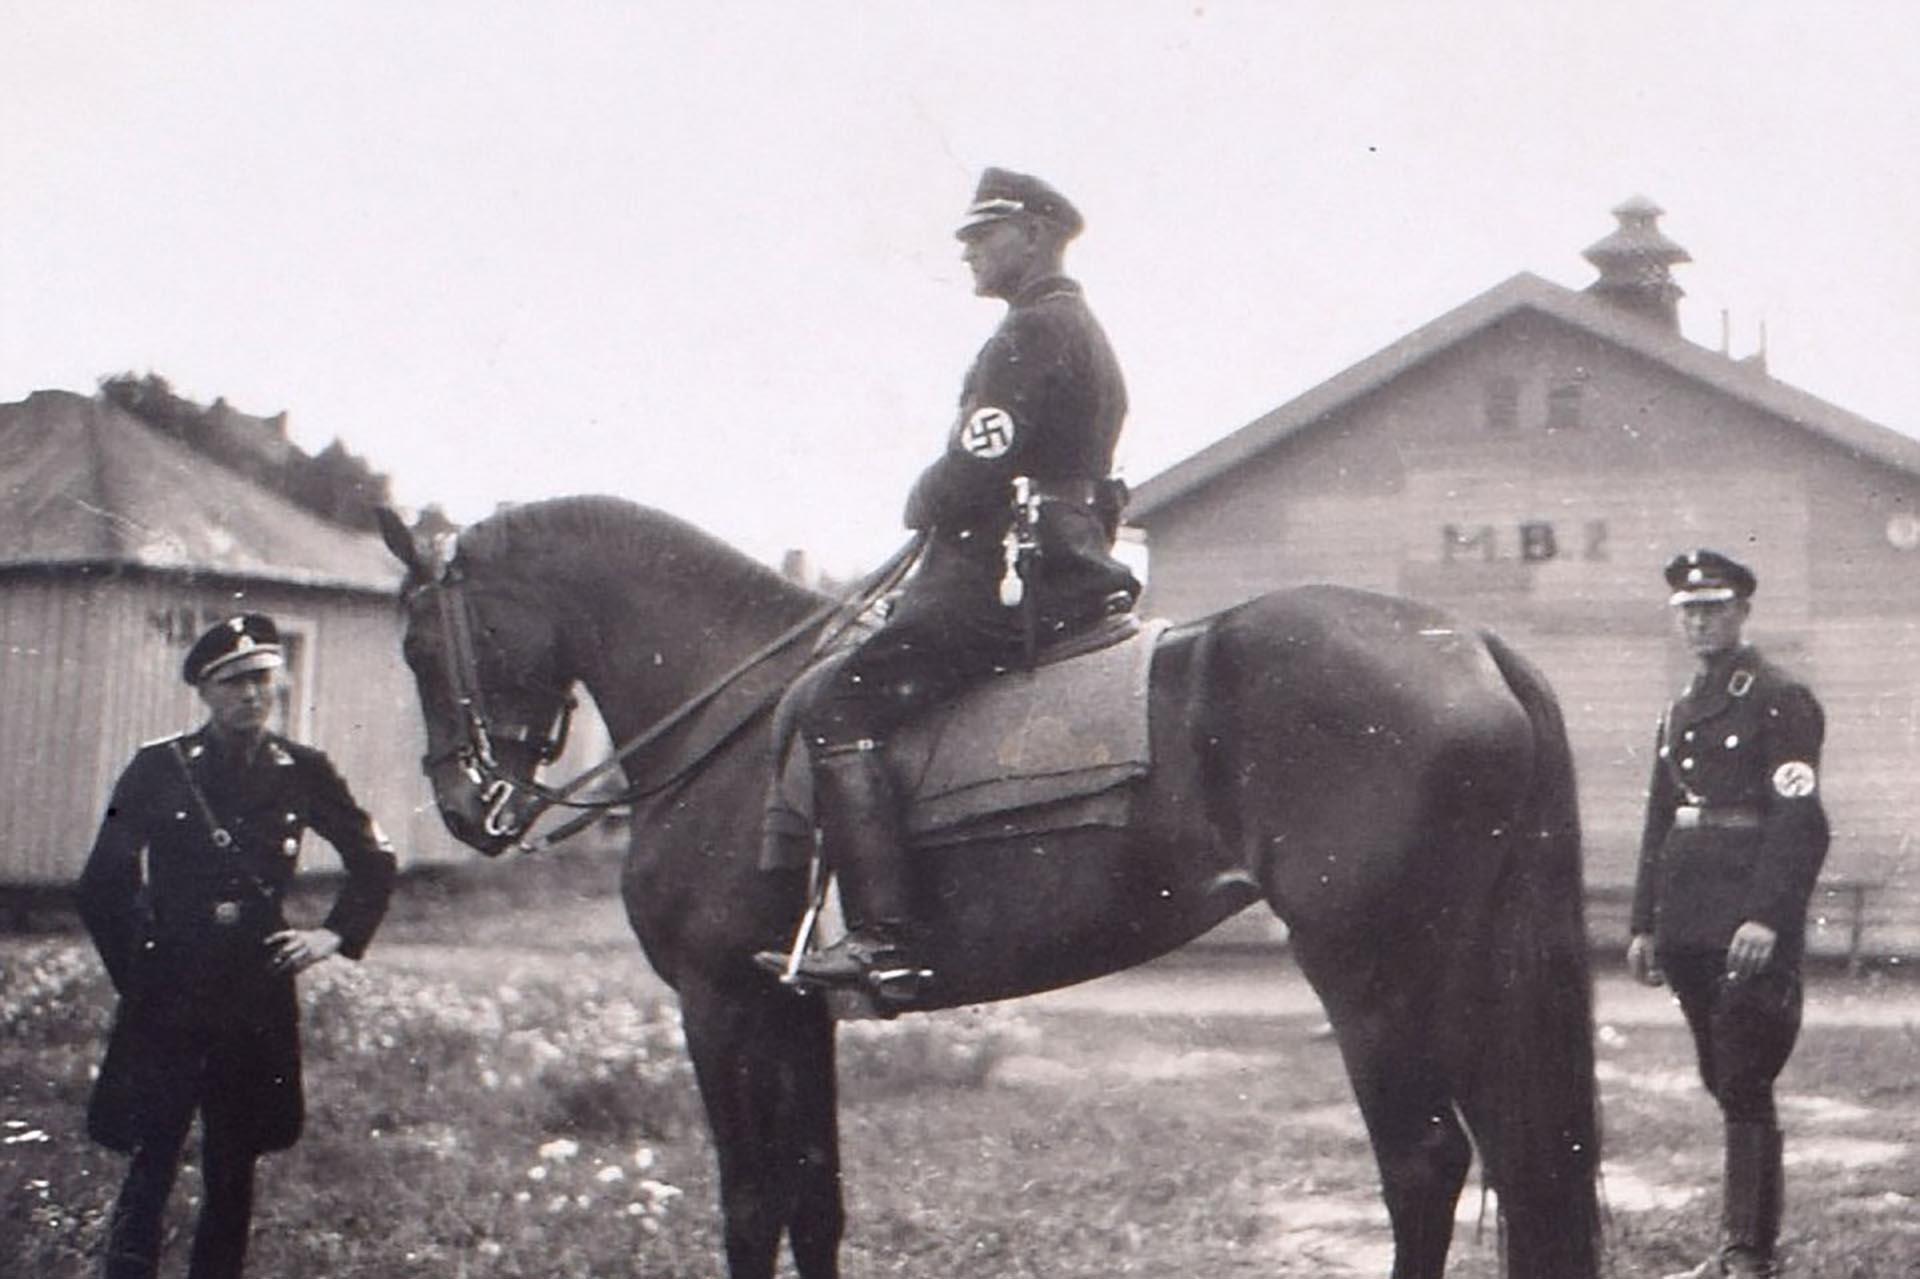 Un oficial nazi en un caballo es observado por otros dos (C&T Auctions/BNPS)